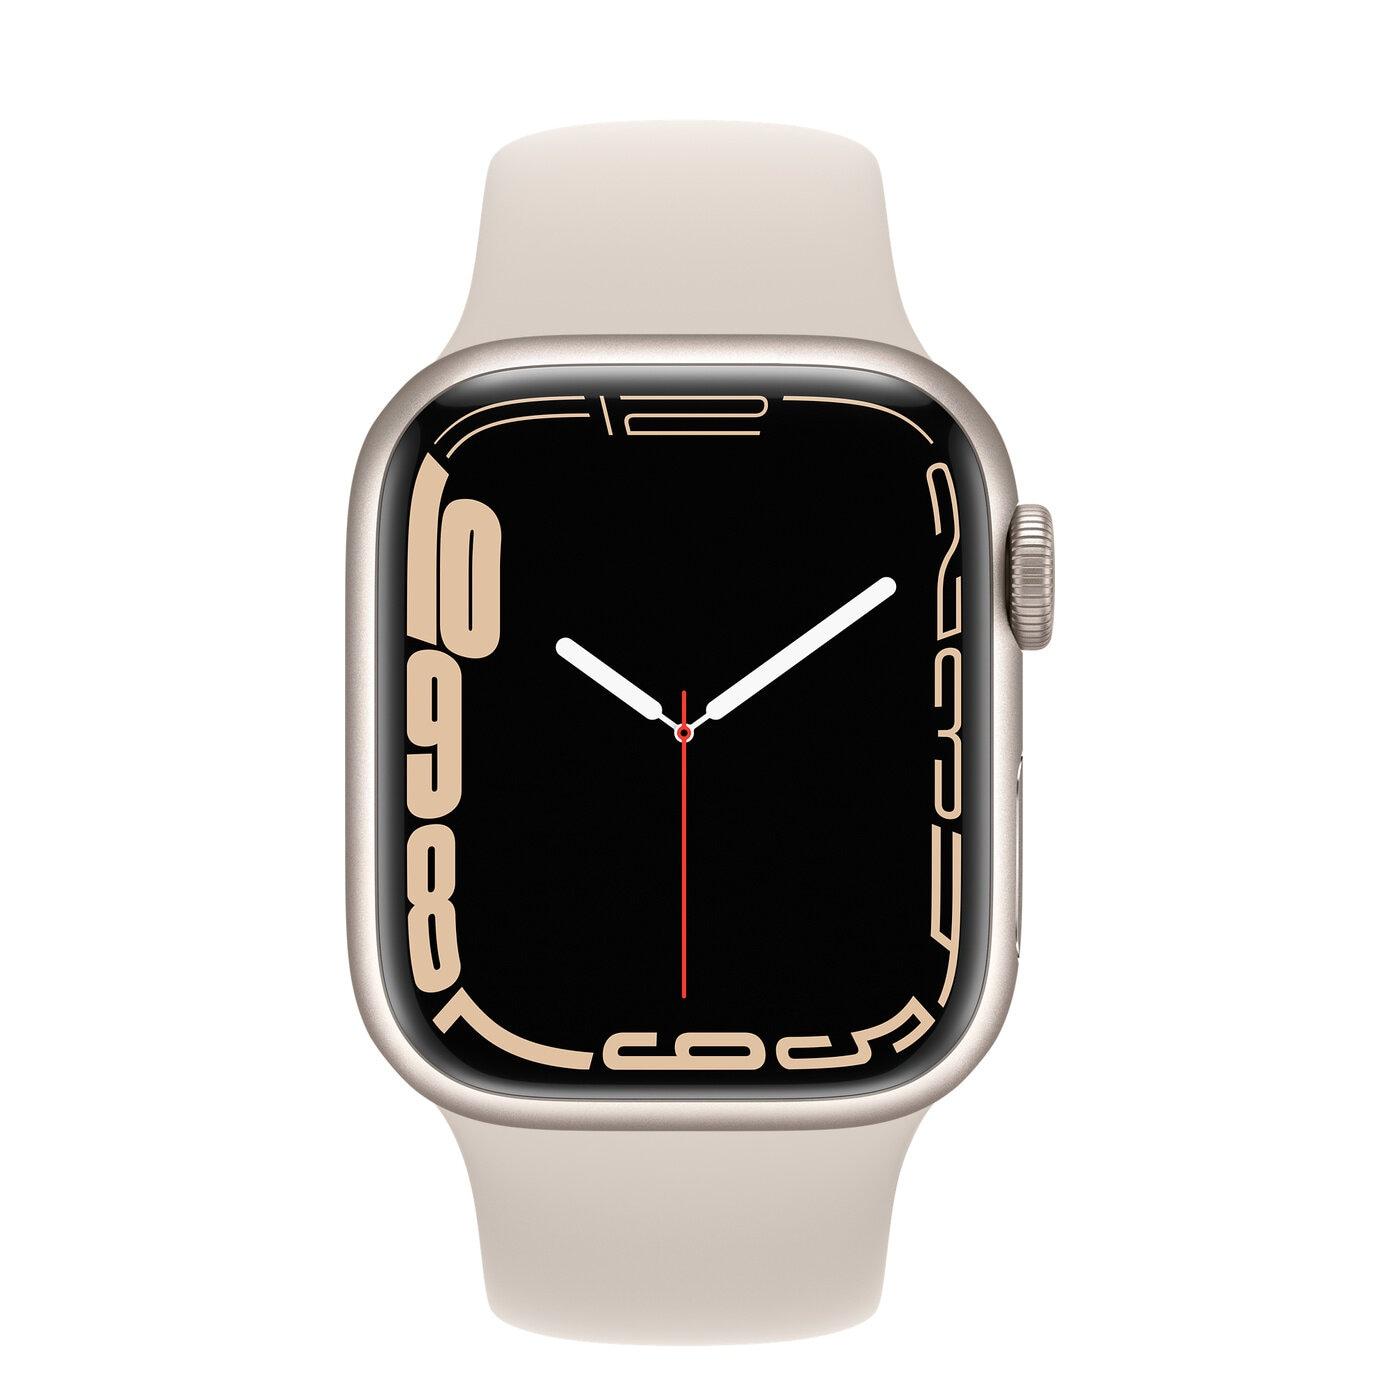 Apple Watch Series 7 Aluminiumboett, Sportband - Stjärnglans